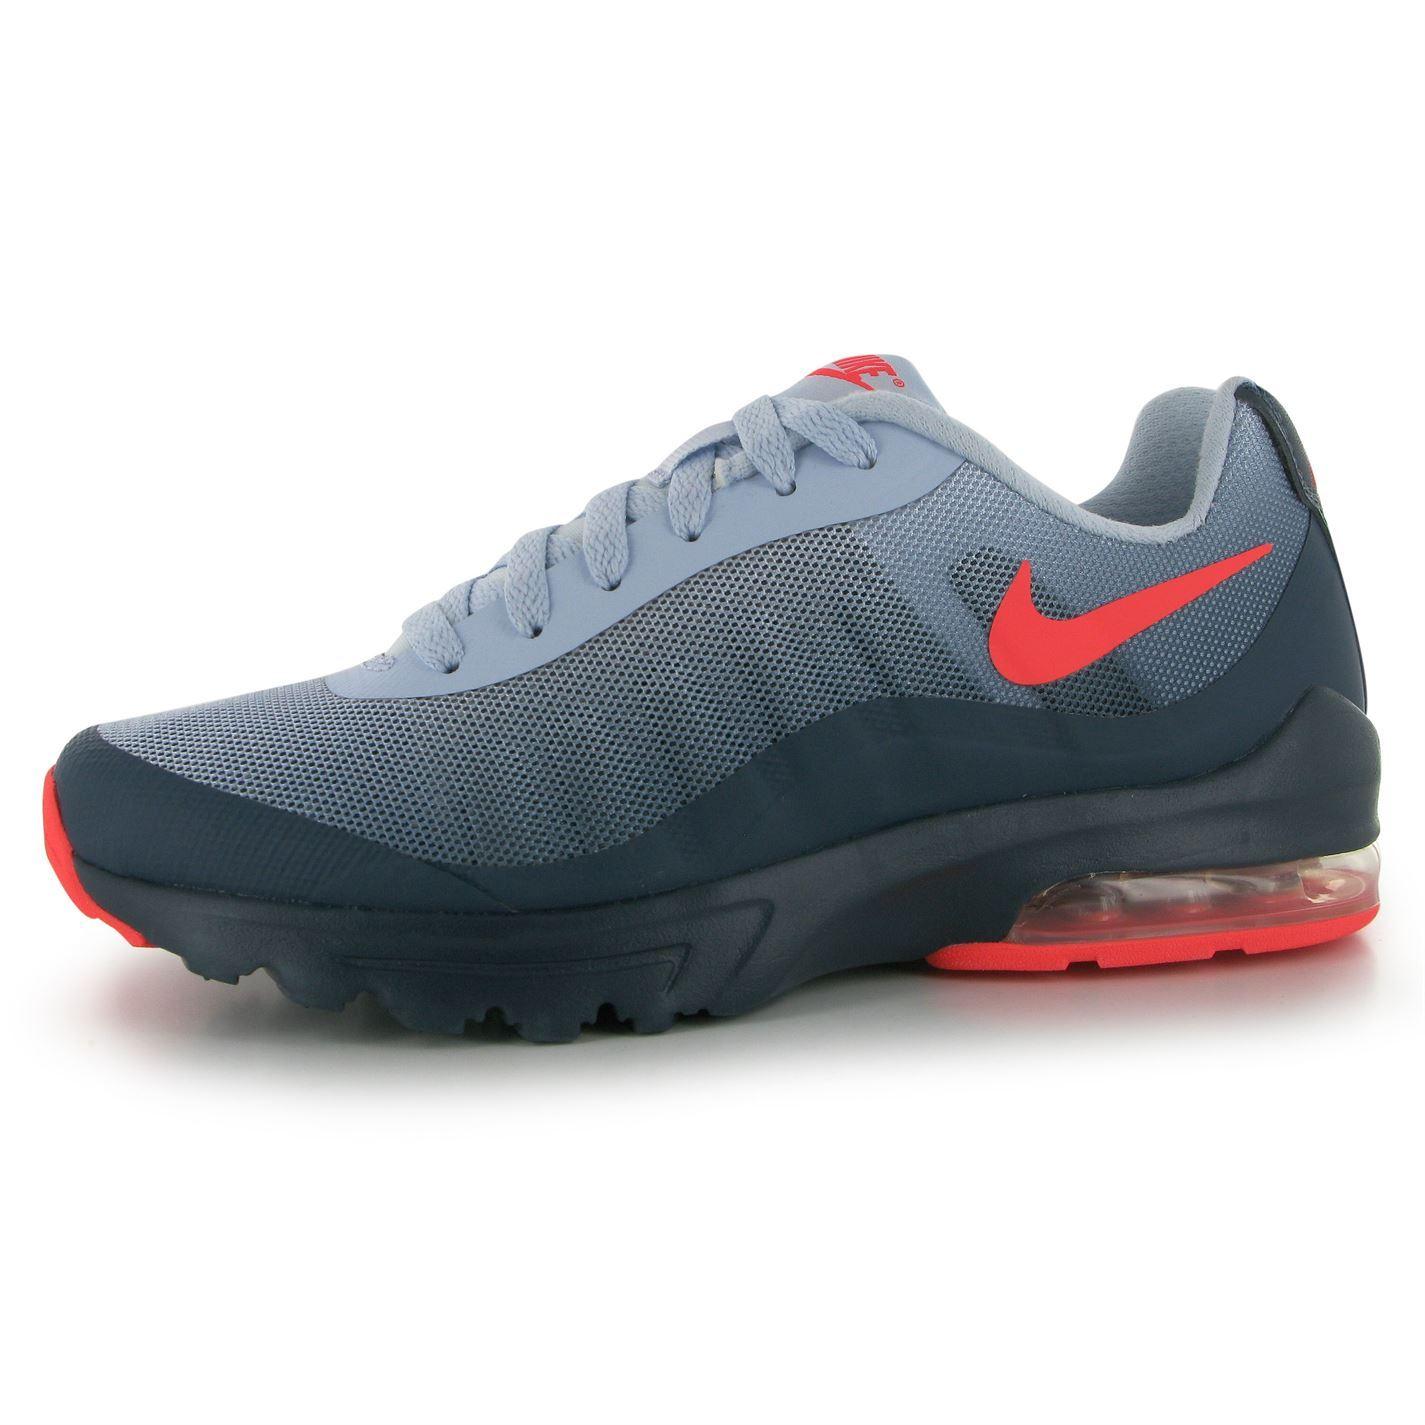 e647bd8c55d Nike Air Max Invigor Famous Footwear For Women